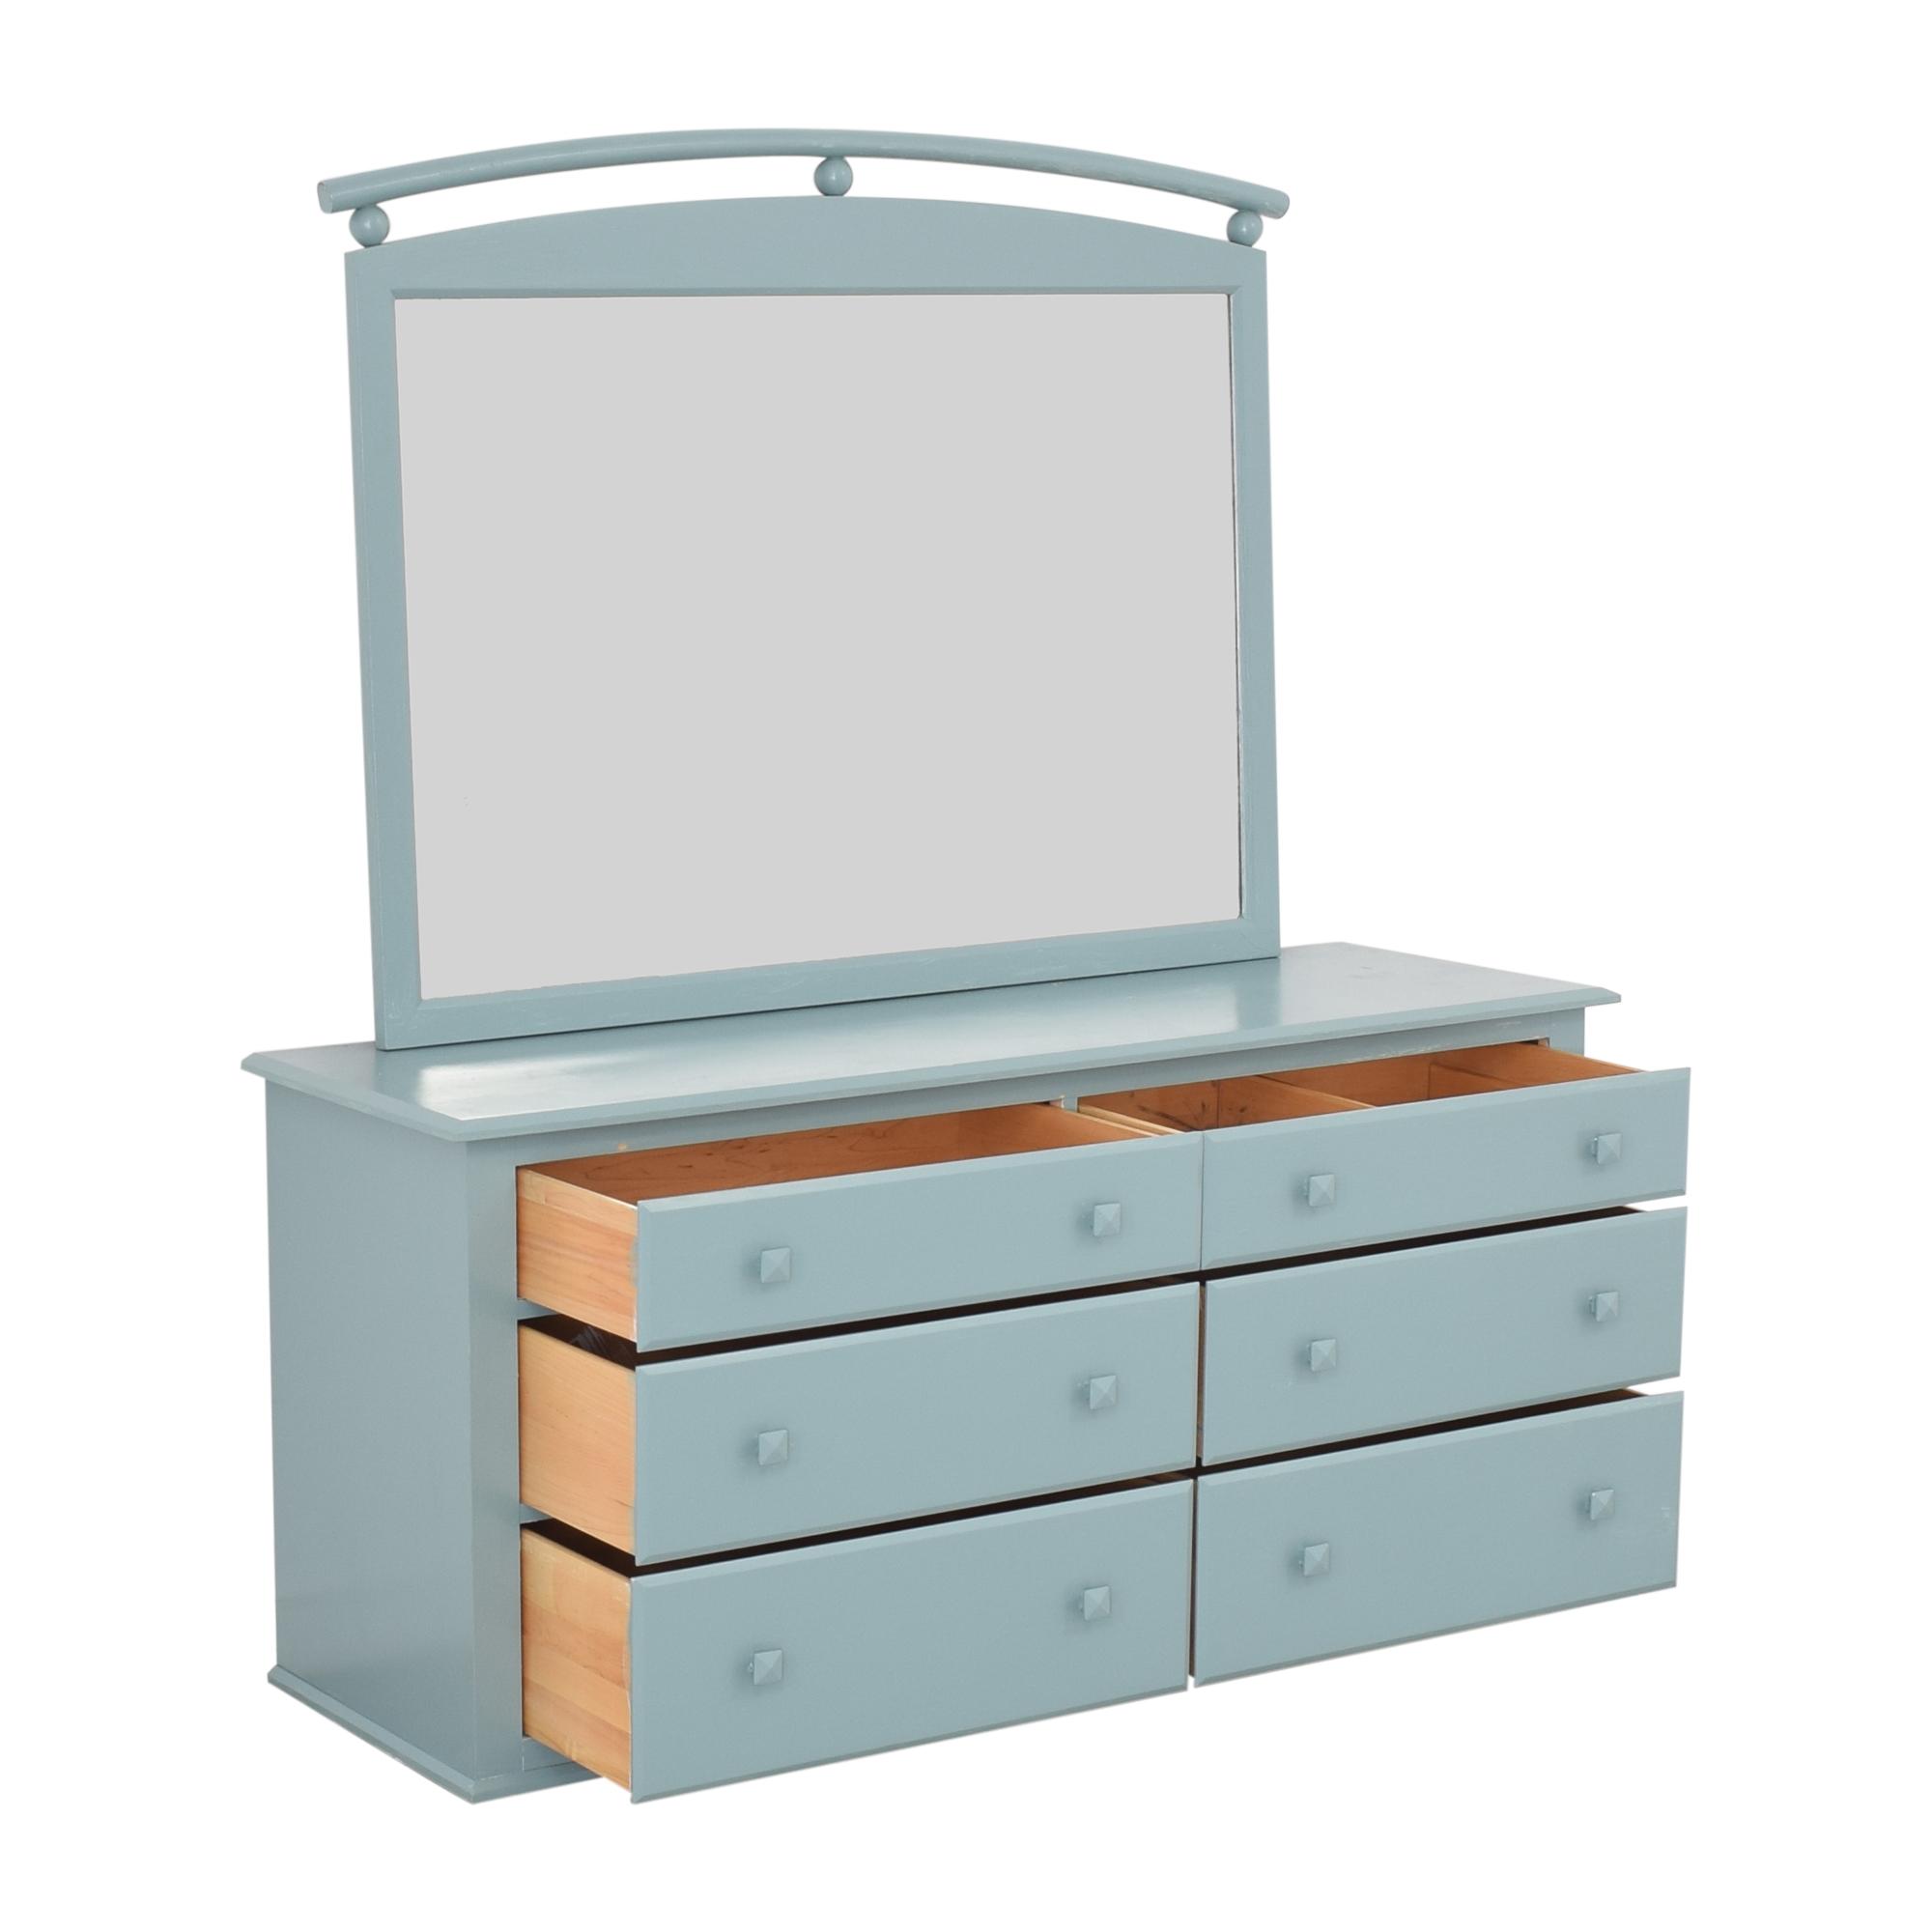 Ethan Allen Ethan Allen American Dimensions Dresser with Mirror dimensions